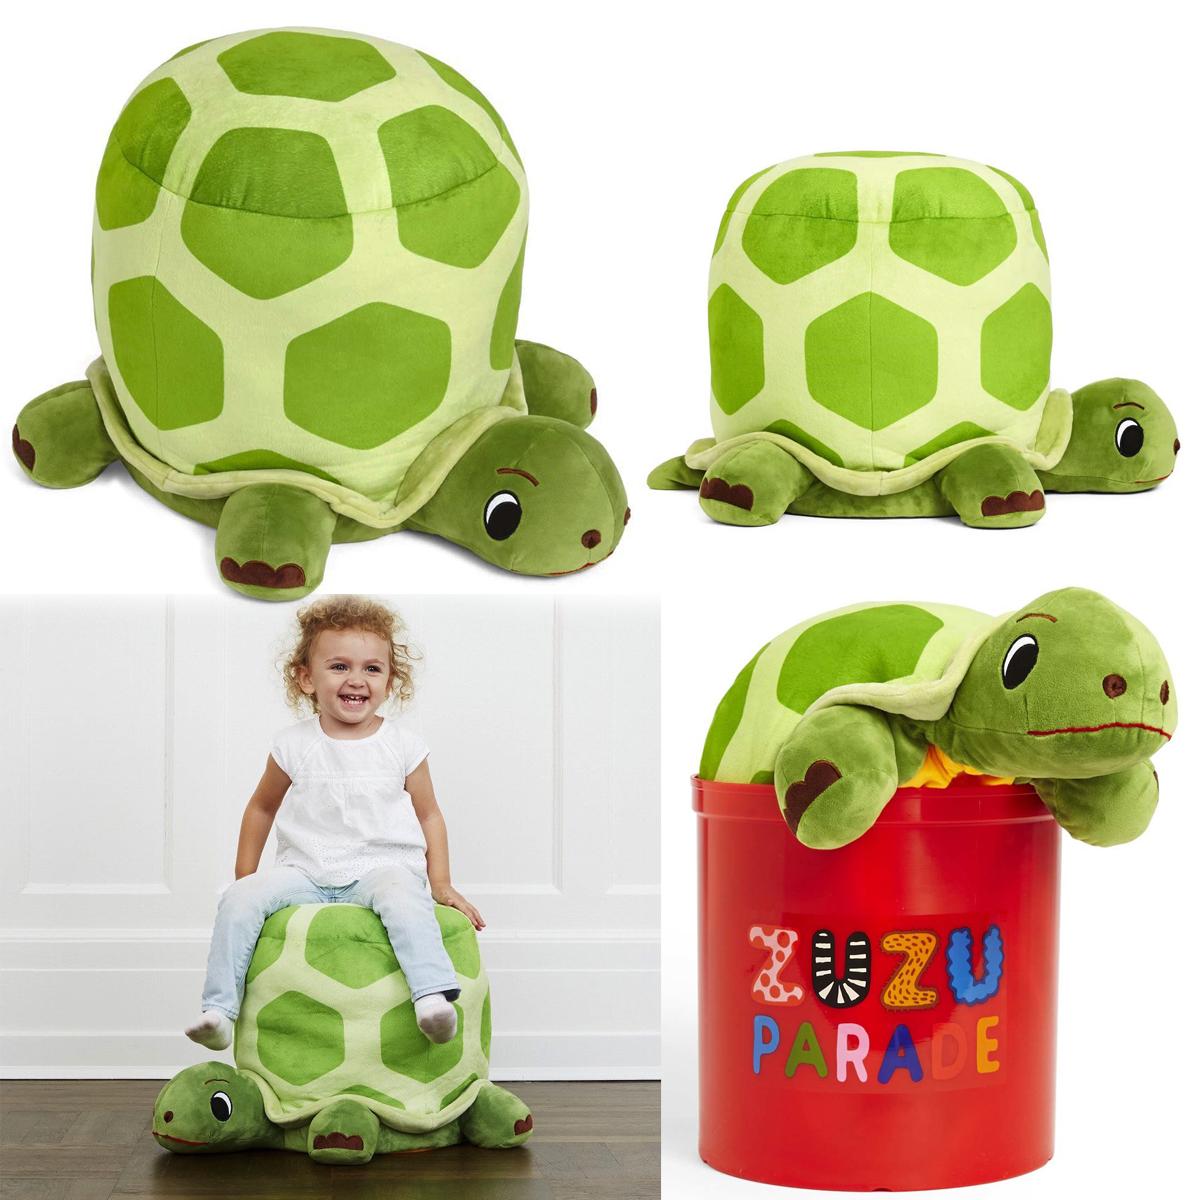 children s stuffed animal chairs fishing chair rucksack zuzu parade kids playroom toy storage